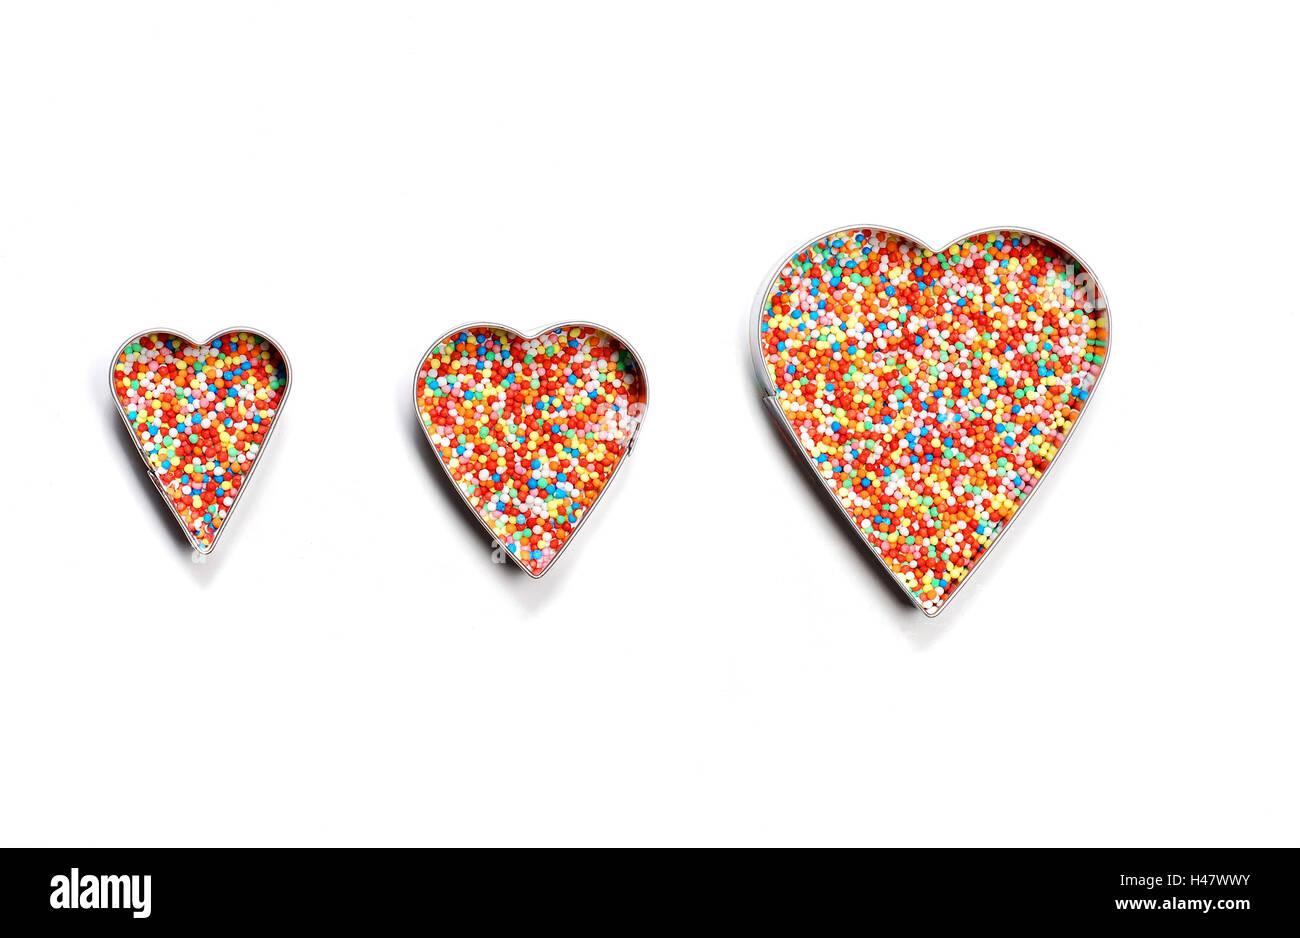 Hearts cookie cutters sugar pearls stuffed cut out yule tide hearts cookie cutters sugar pearls stuffed cut out yule tide biocorpaavc